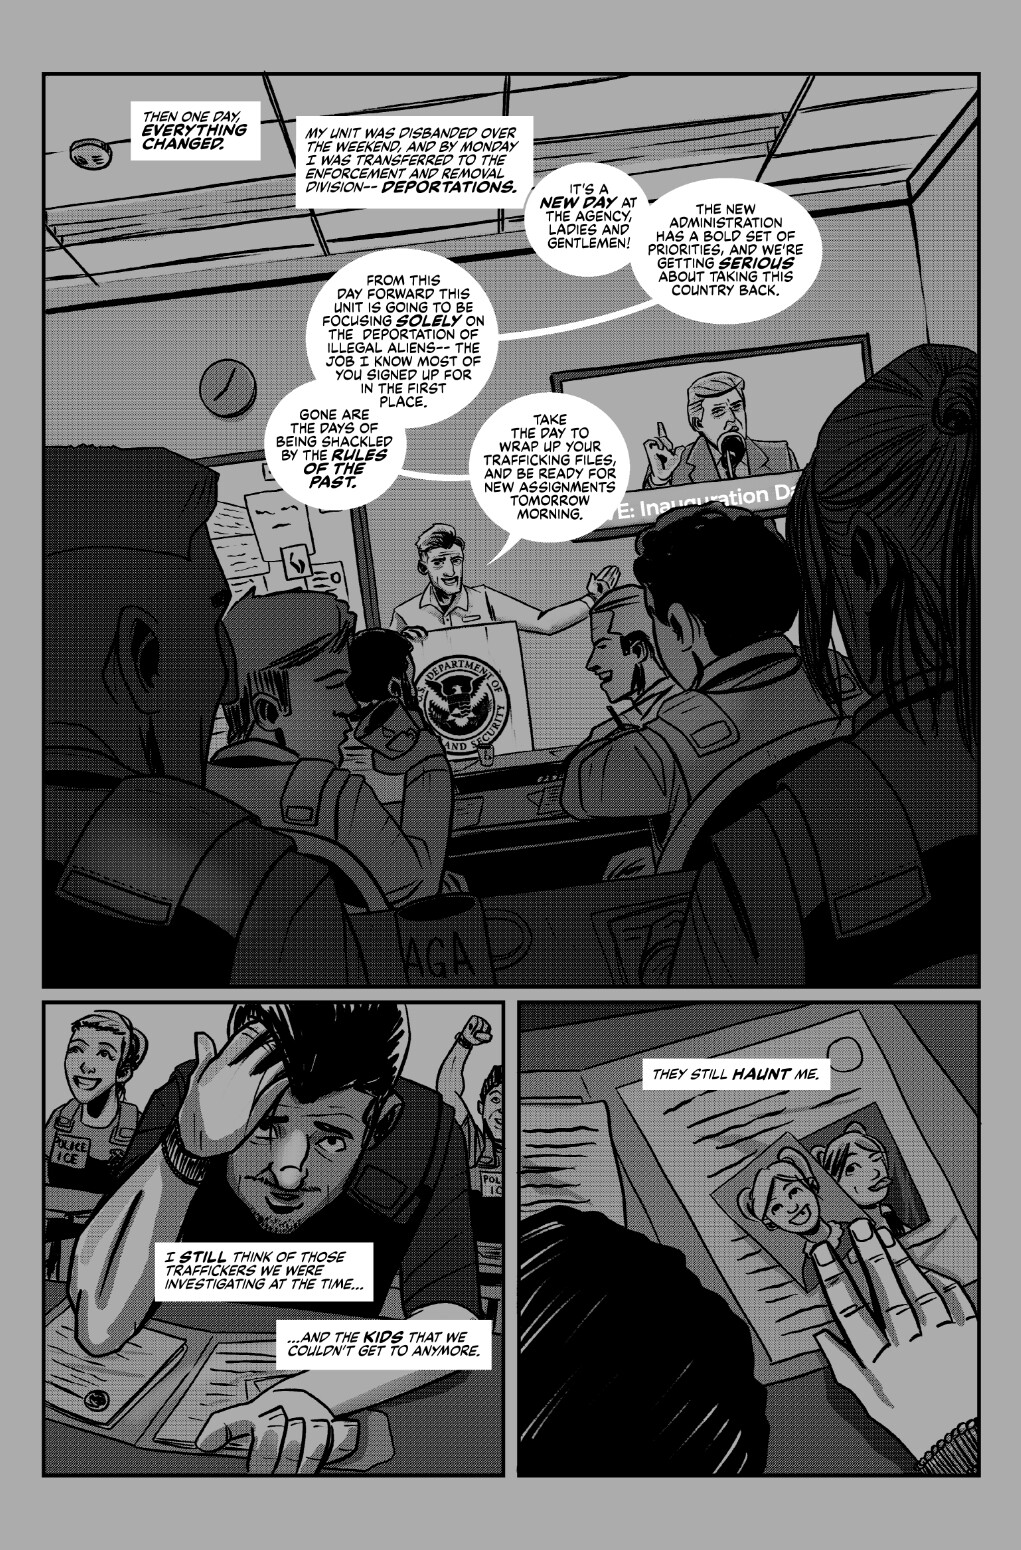 Sincerely, Agent Mejía: Page 3